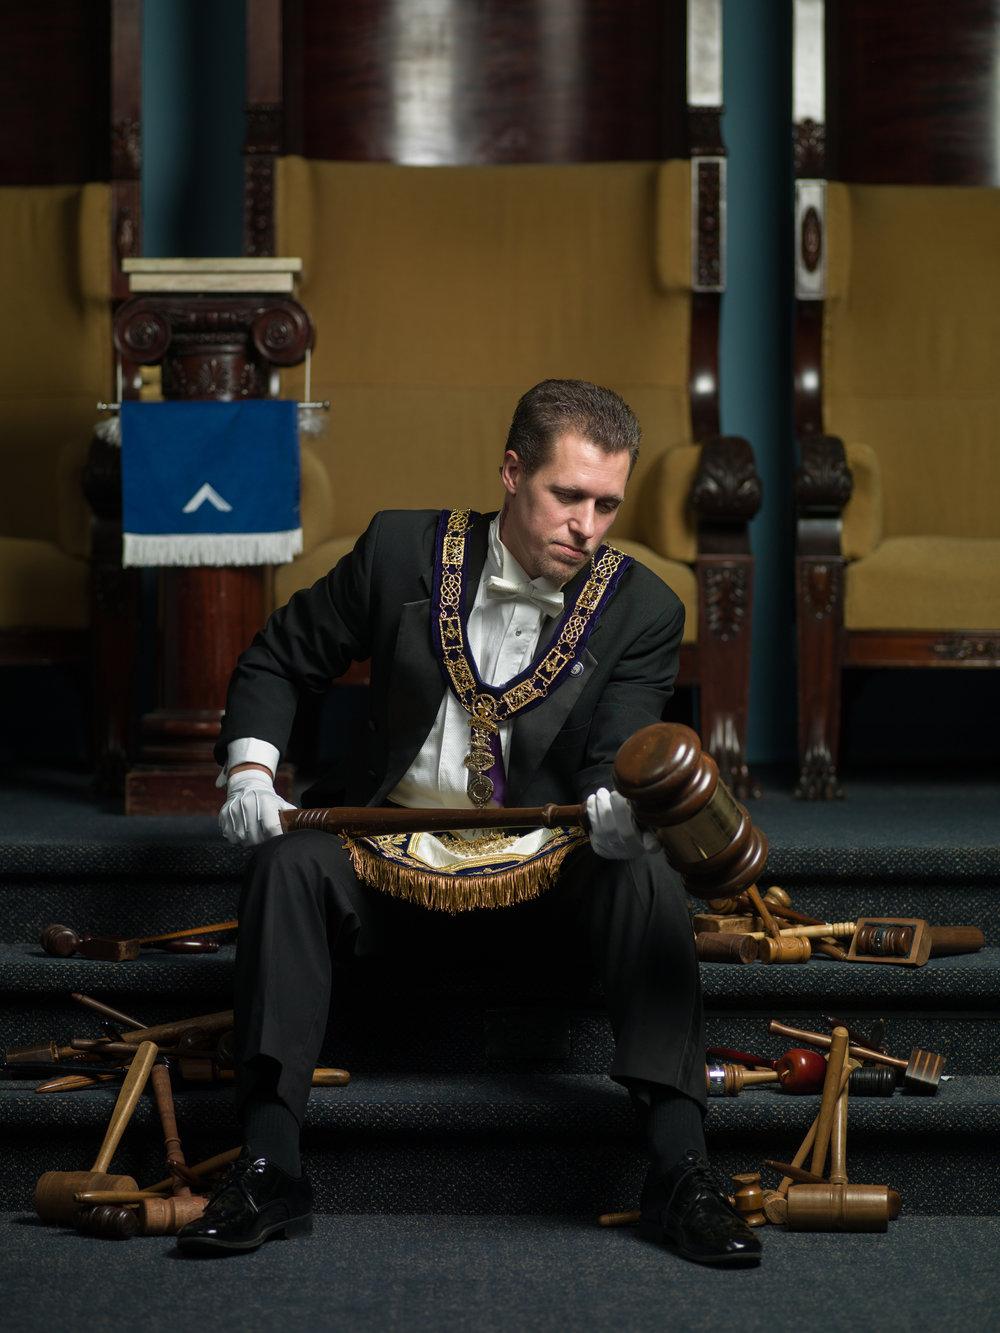 Joshua M. Woodwyk, Grand Master of the Grand Lodge of Michigan and service veteran.